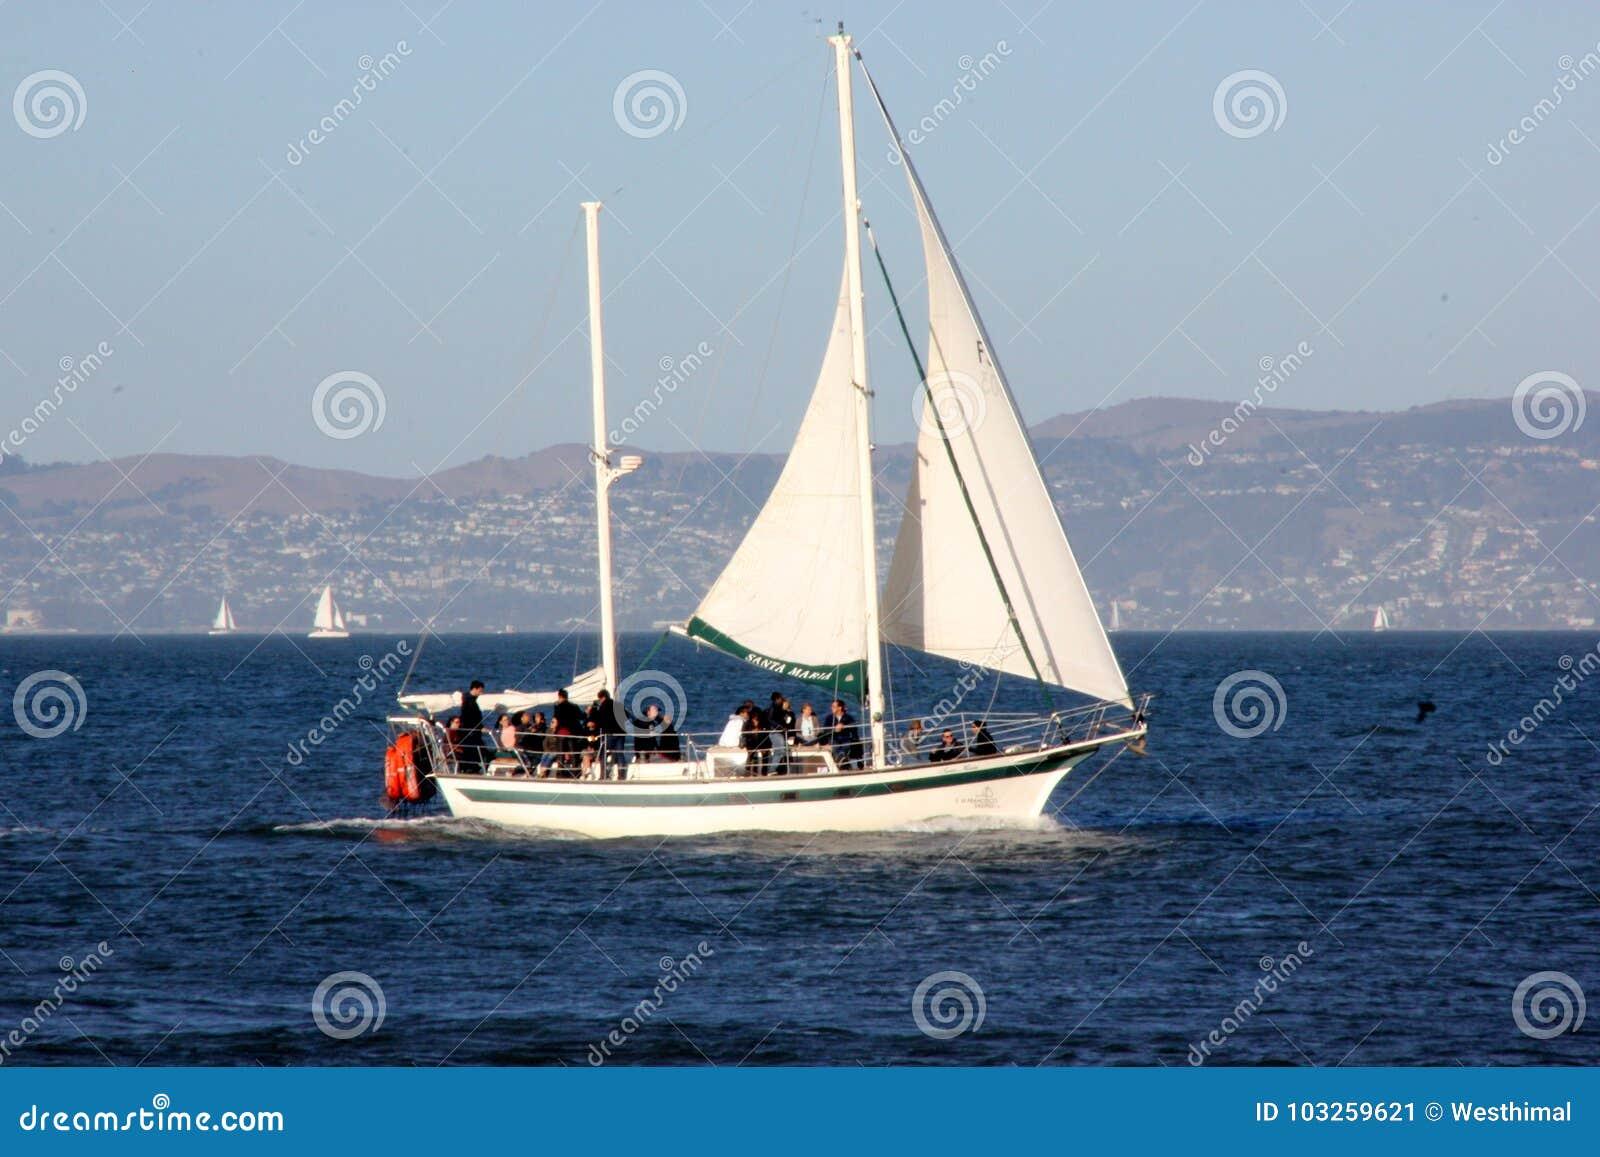 Barco de Santa Maria Sailing, um iate de San Francisco Sailing Company